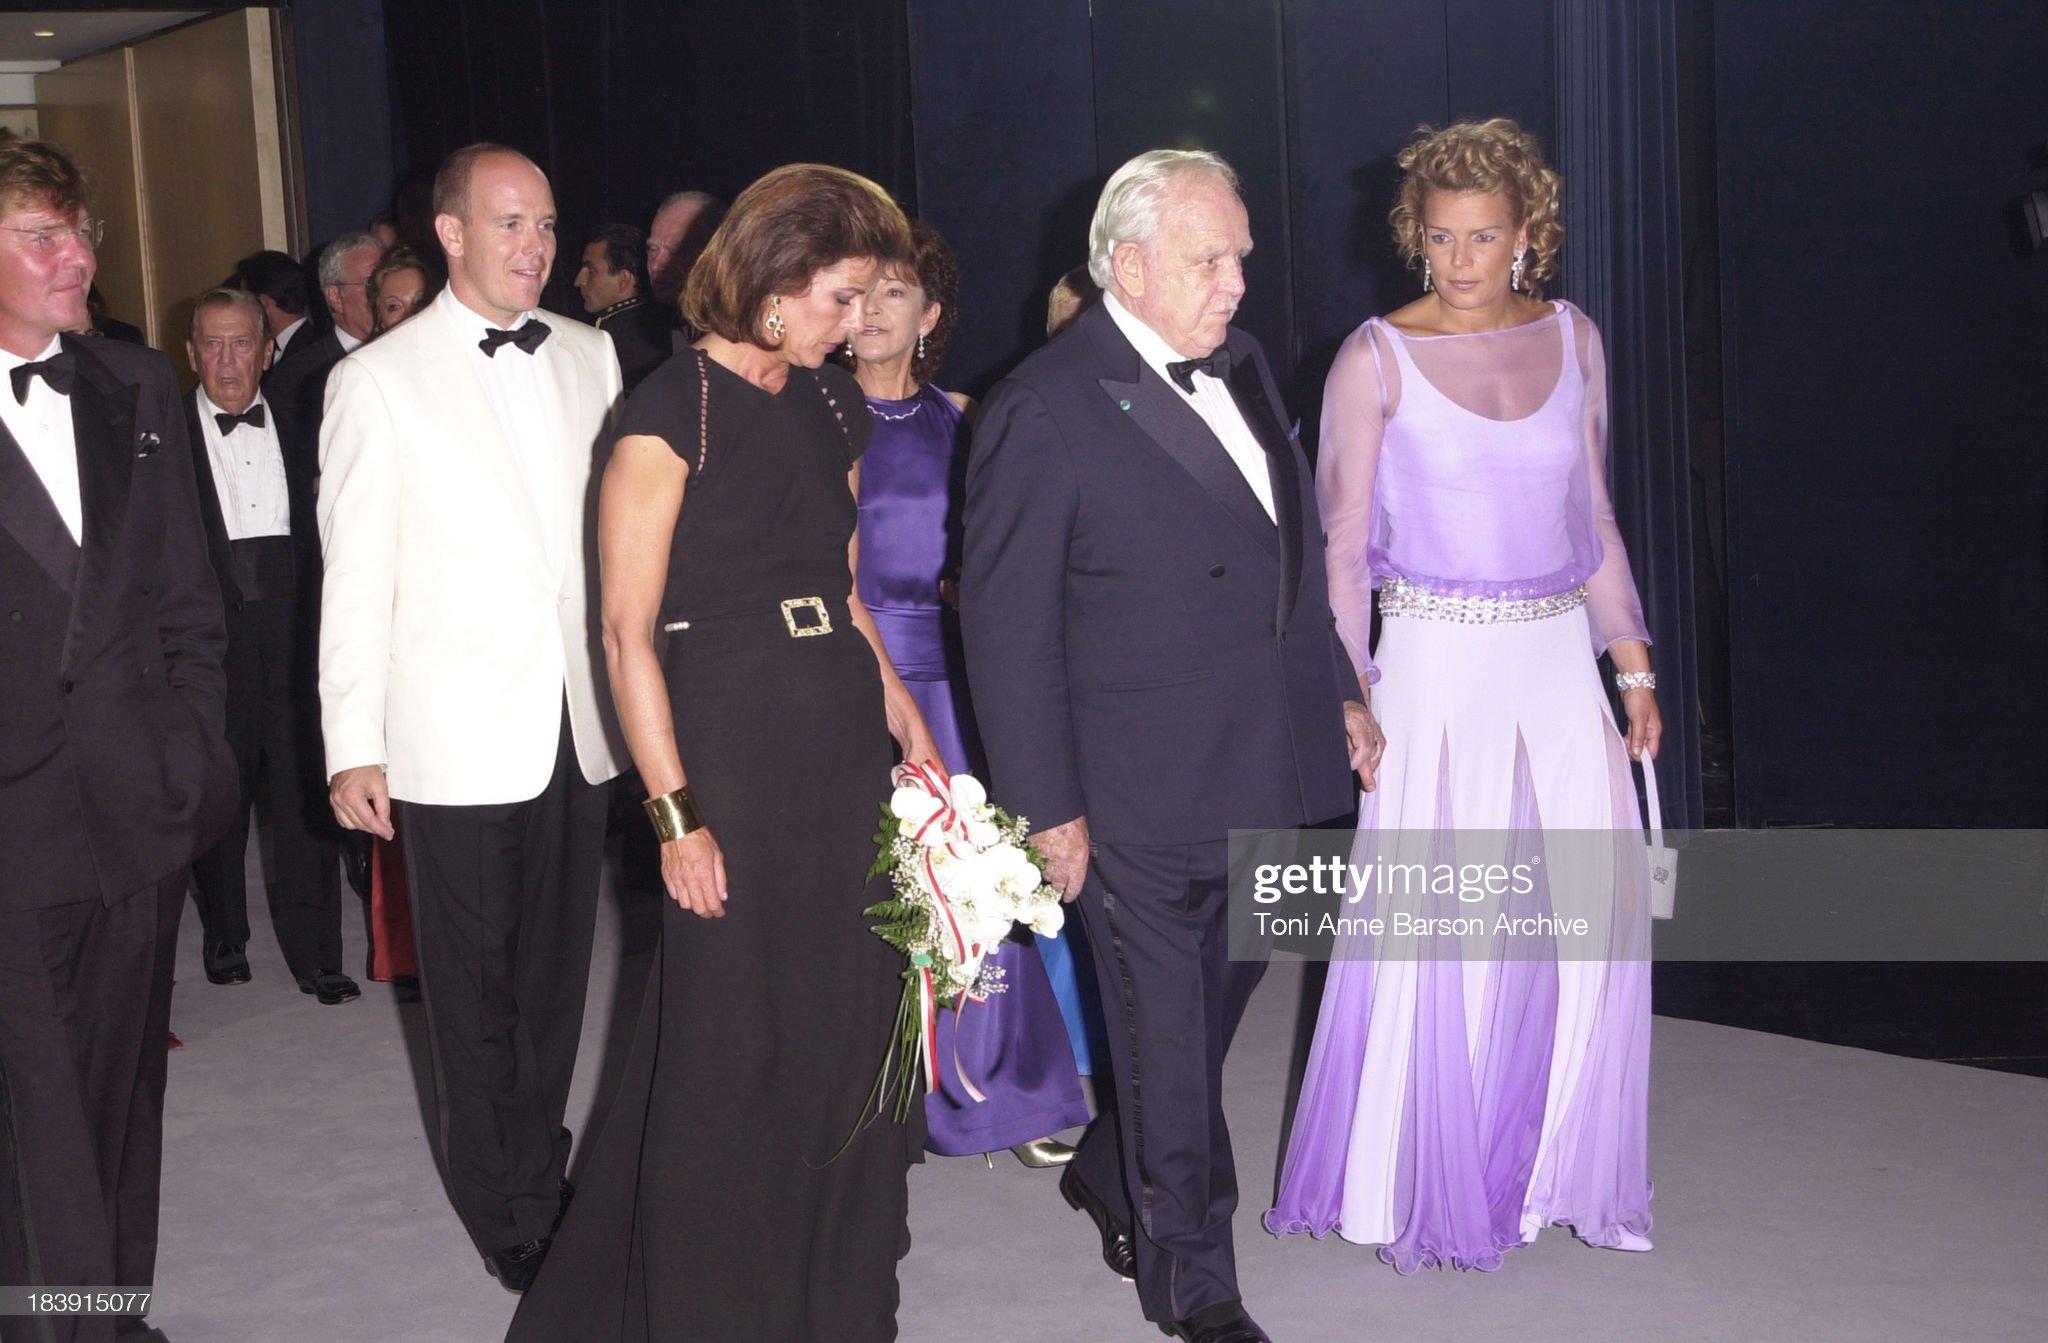 Вечерние наряды Принцессы Каролины. Red Cross Ball 2001- Ball Opening : News Photo